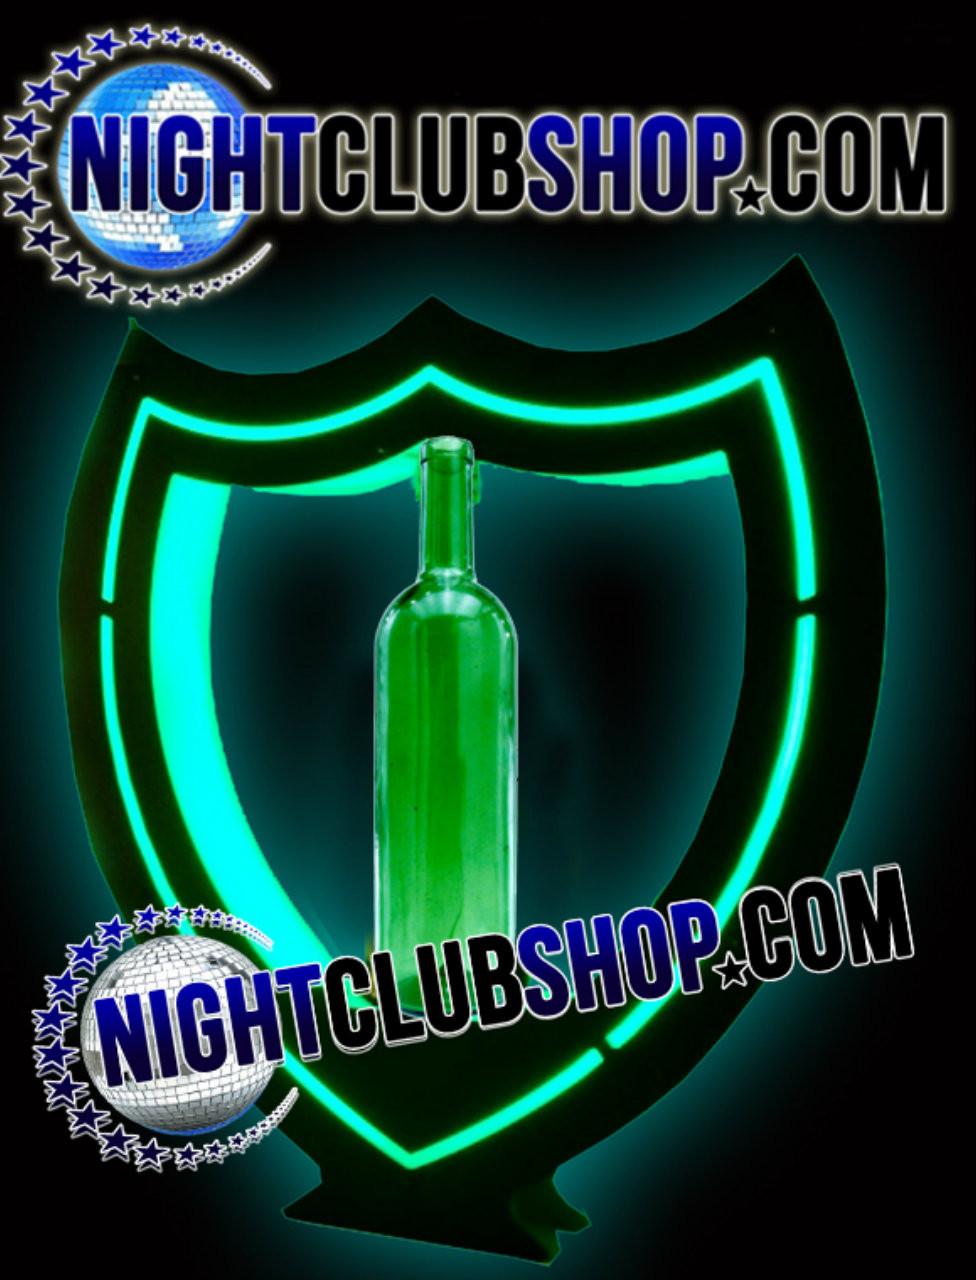 DOM, P, perignon, Dom Perignon, Caddie, presenter, bottle, highlight, carrier, glorifier, LED, Tray